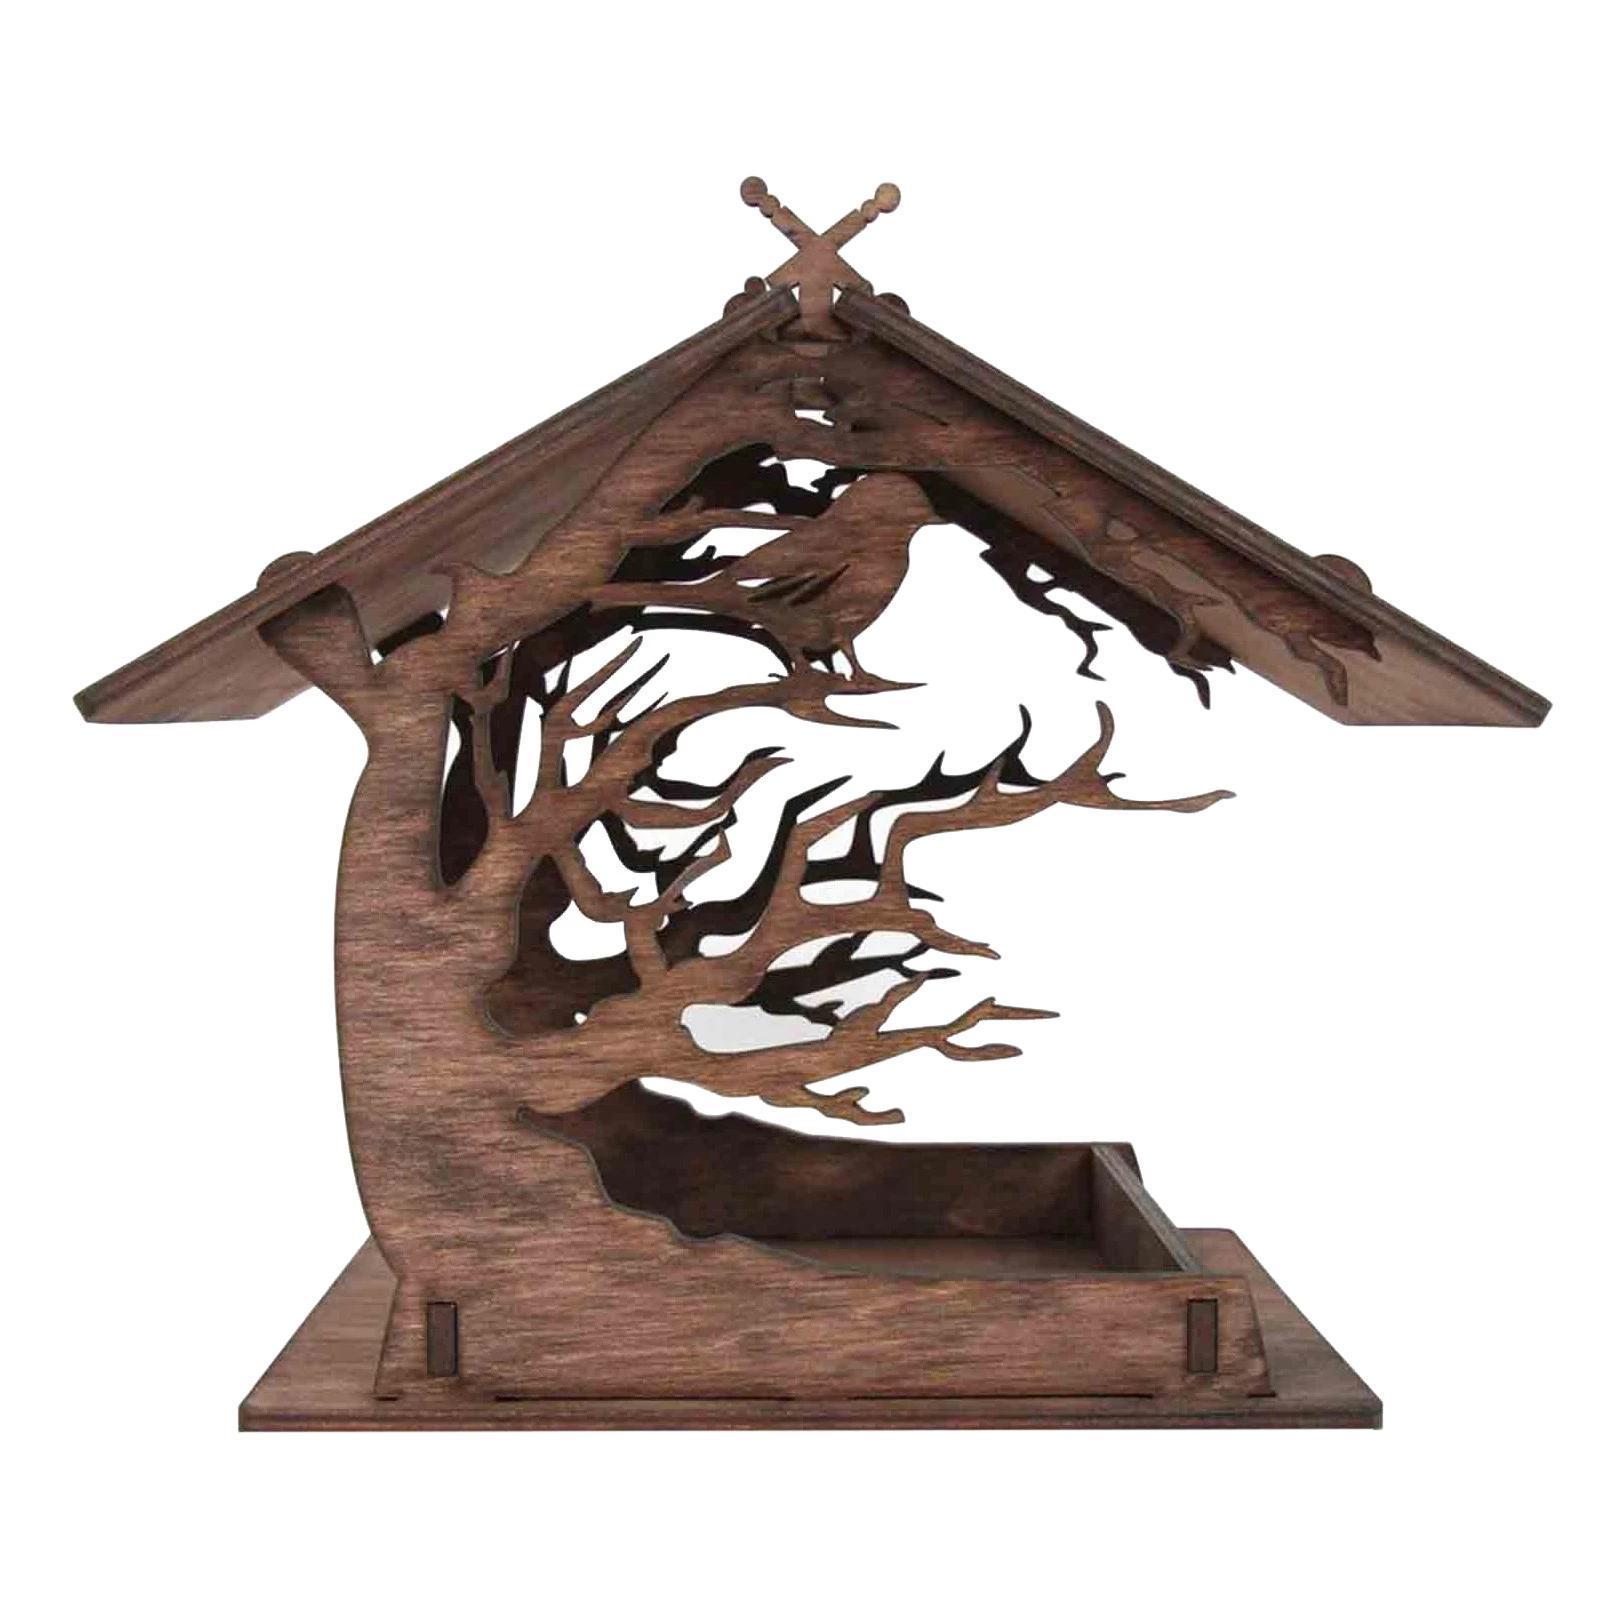 thumbnail 3 - Wooden Bird Feeder Balcony Ranch Decoration Ornaments Wildbird Essentials